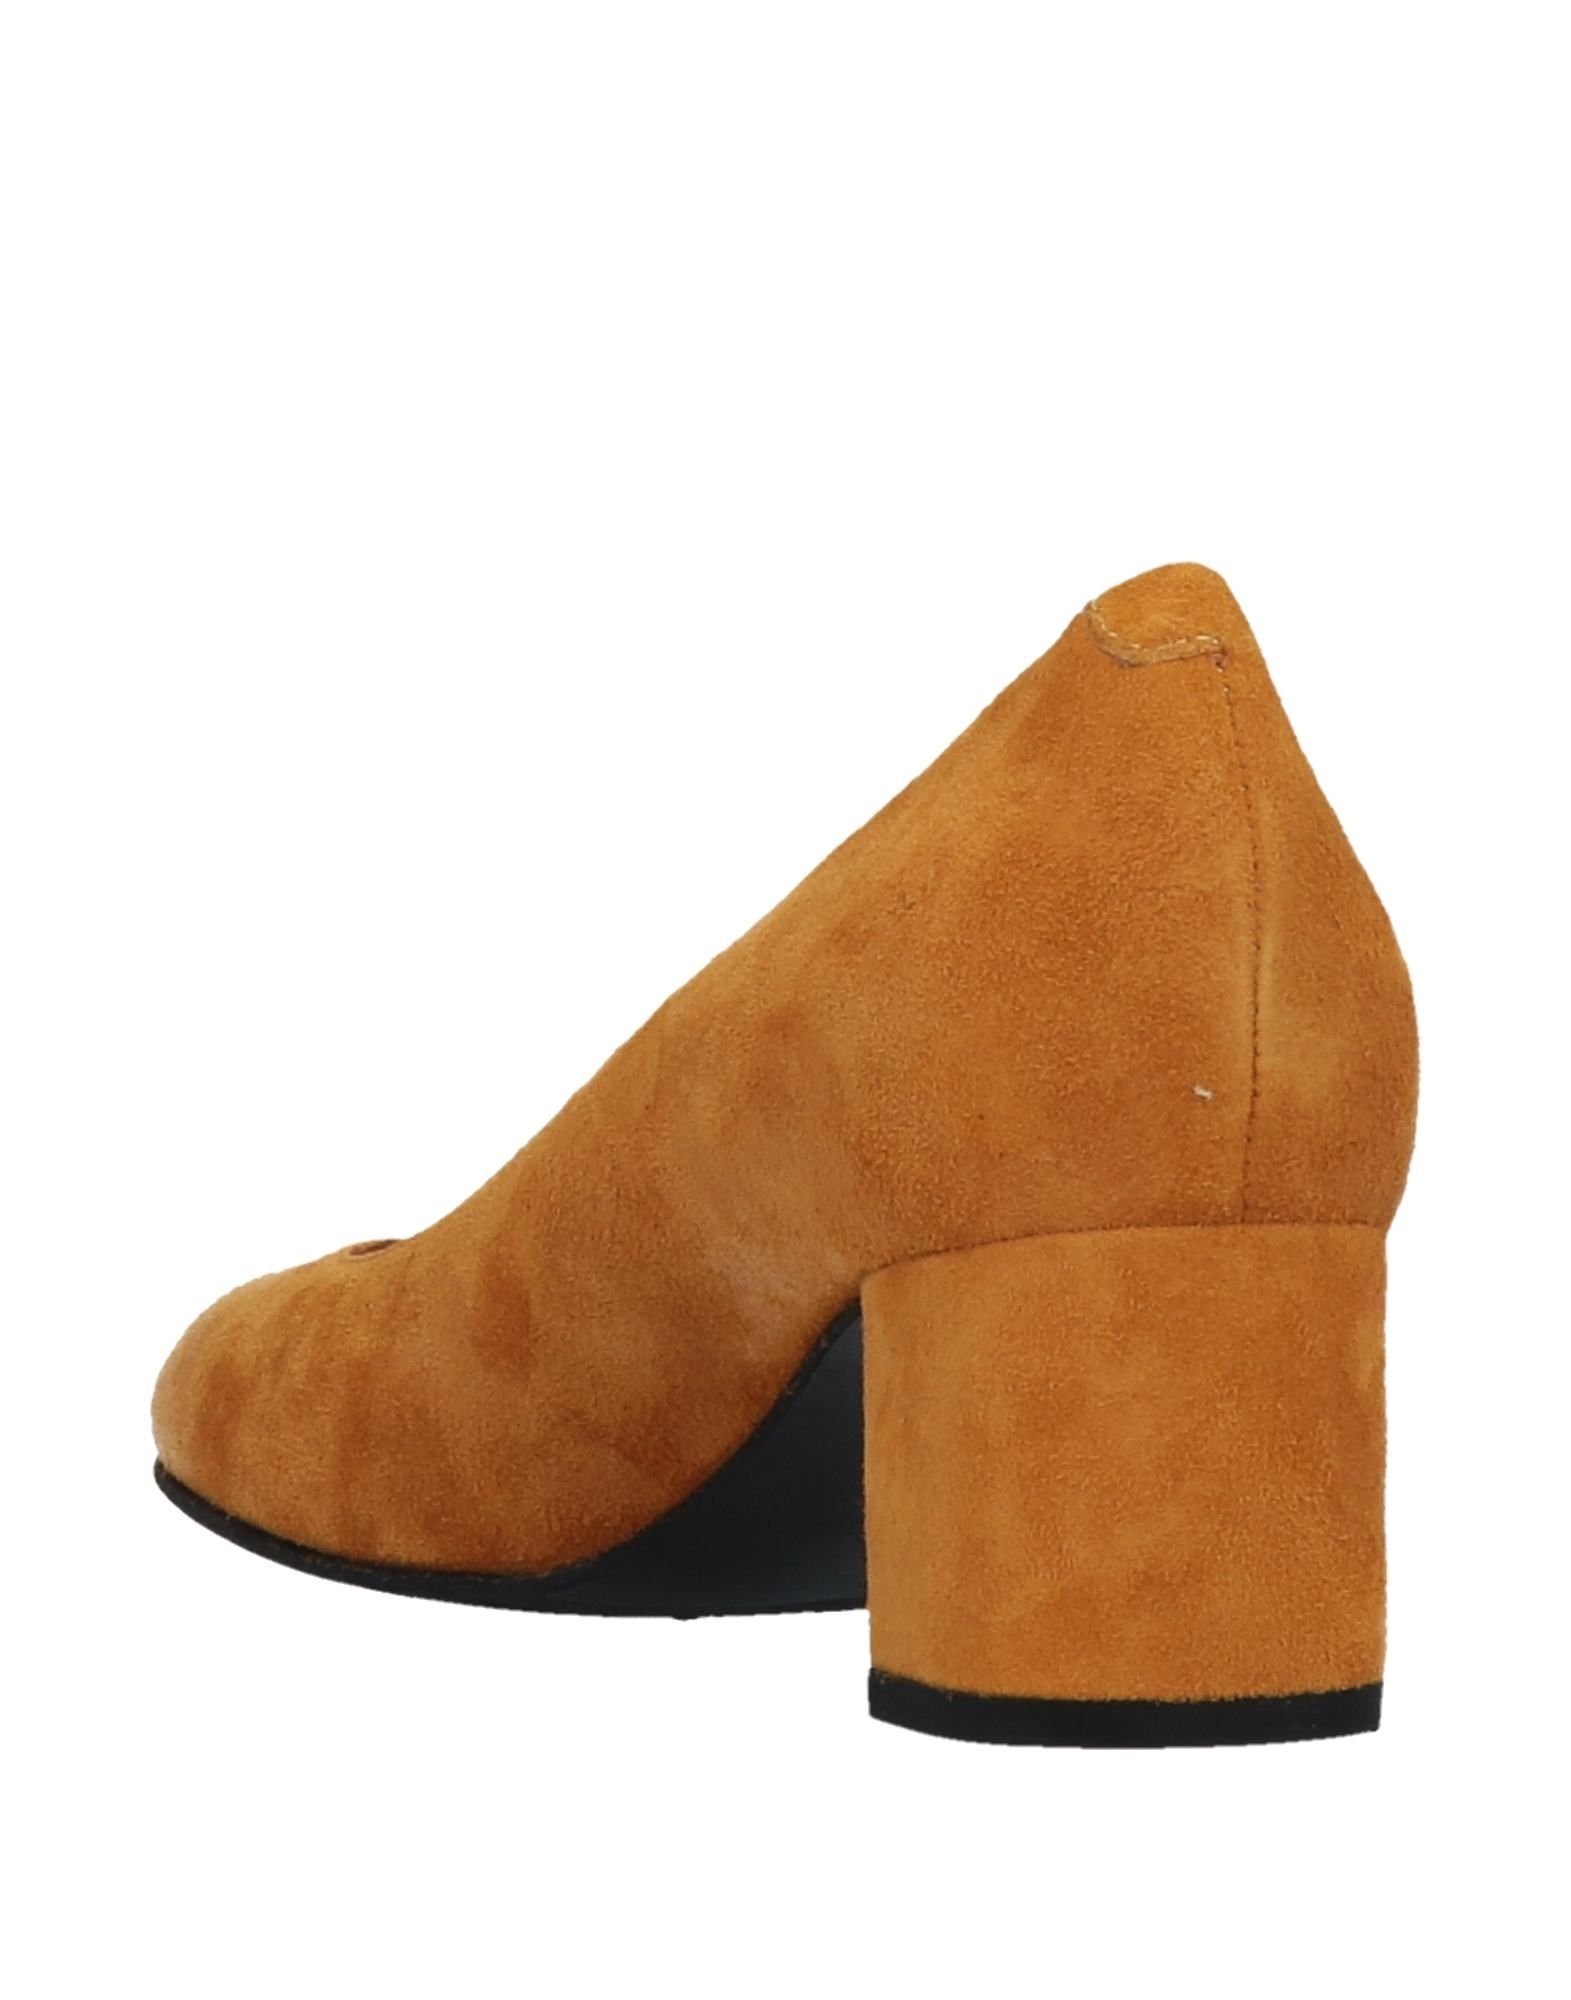 Stilvolle billige Schuhe Damen Pas De Rouge Pumps Damen Schuhe  11510777IG 5c4d1e